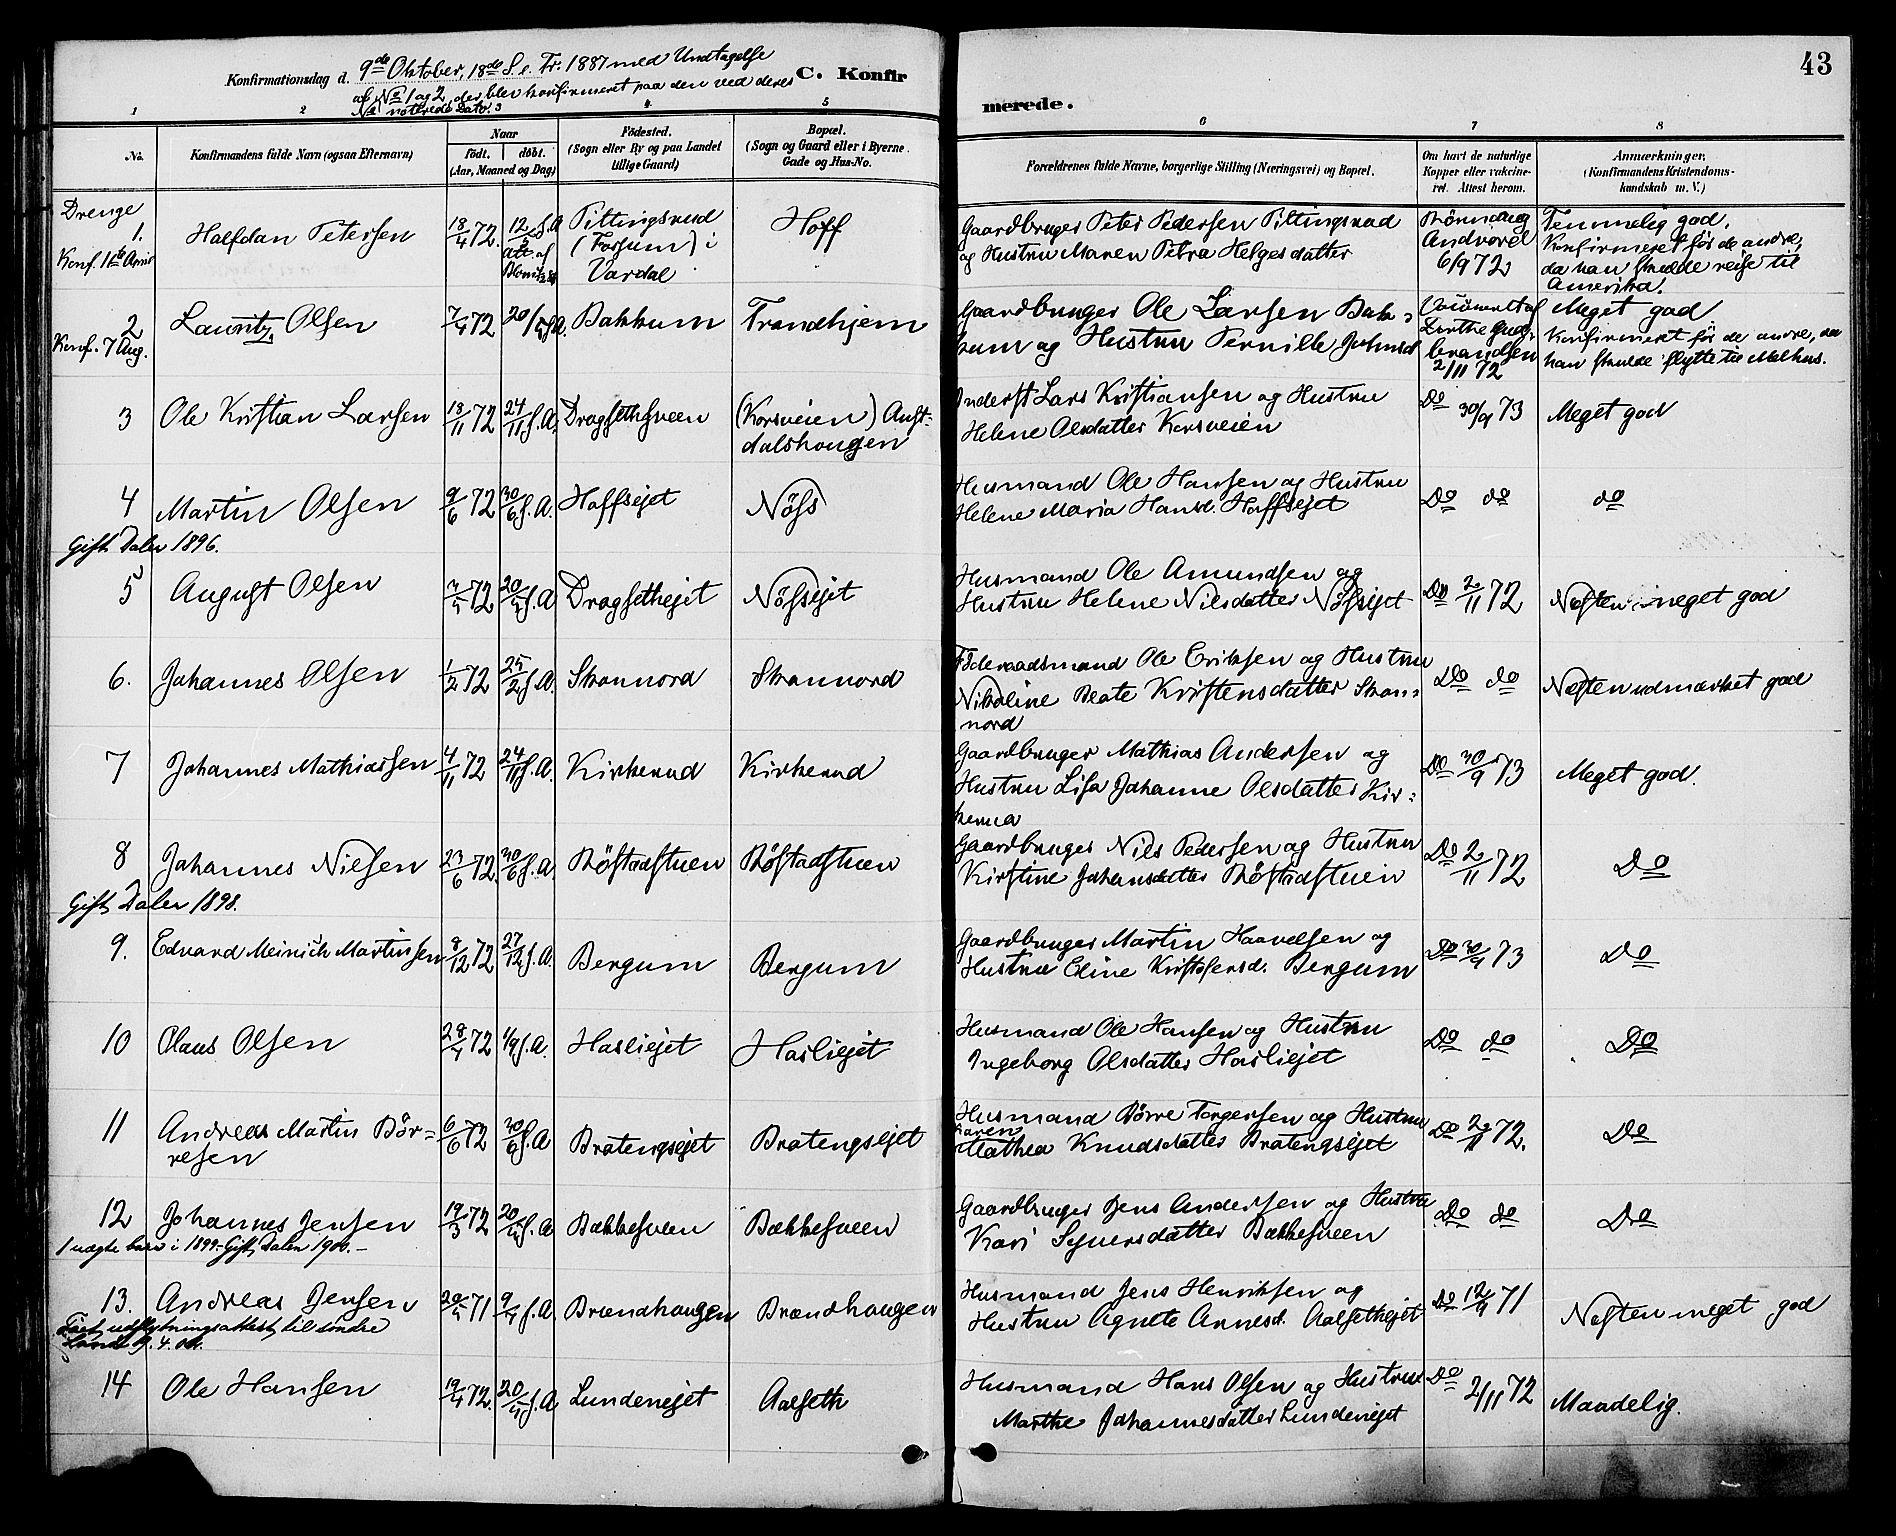 SAH, Biri prestekontor, Ministerialbok nr. 7, 1887-1893, s. 43